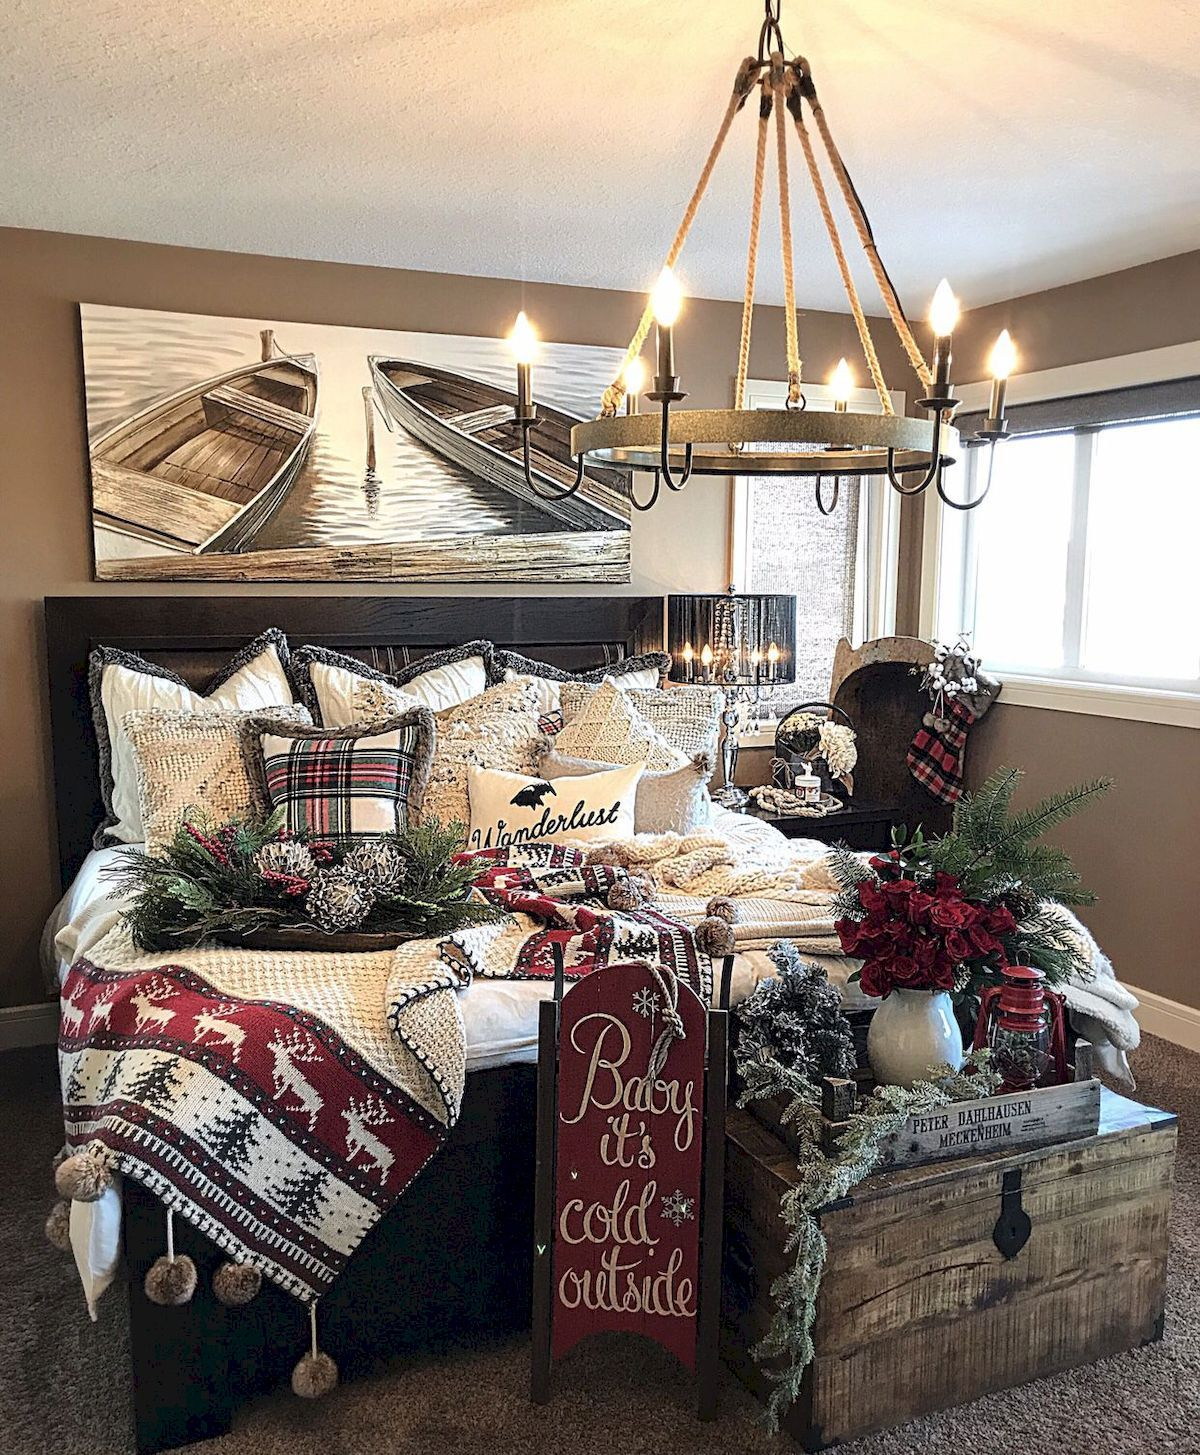 39 Trendy & Cozy Christmas Bedroom Decorating Ideas